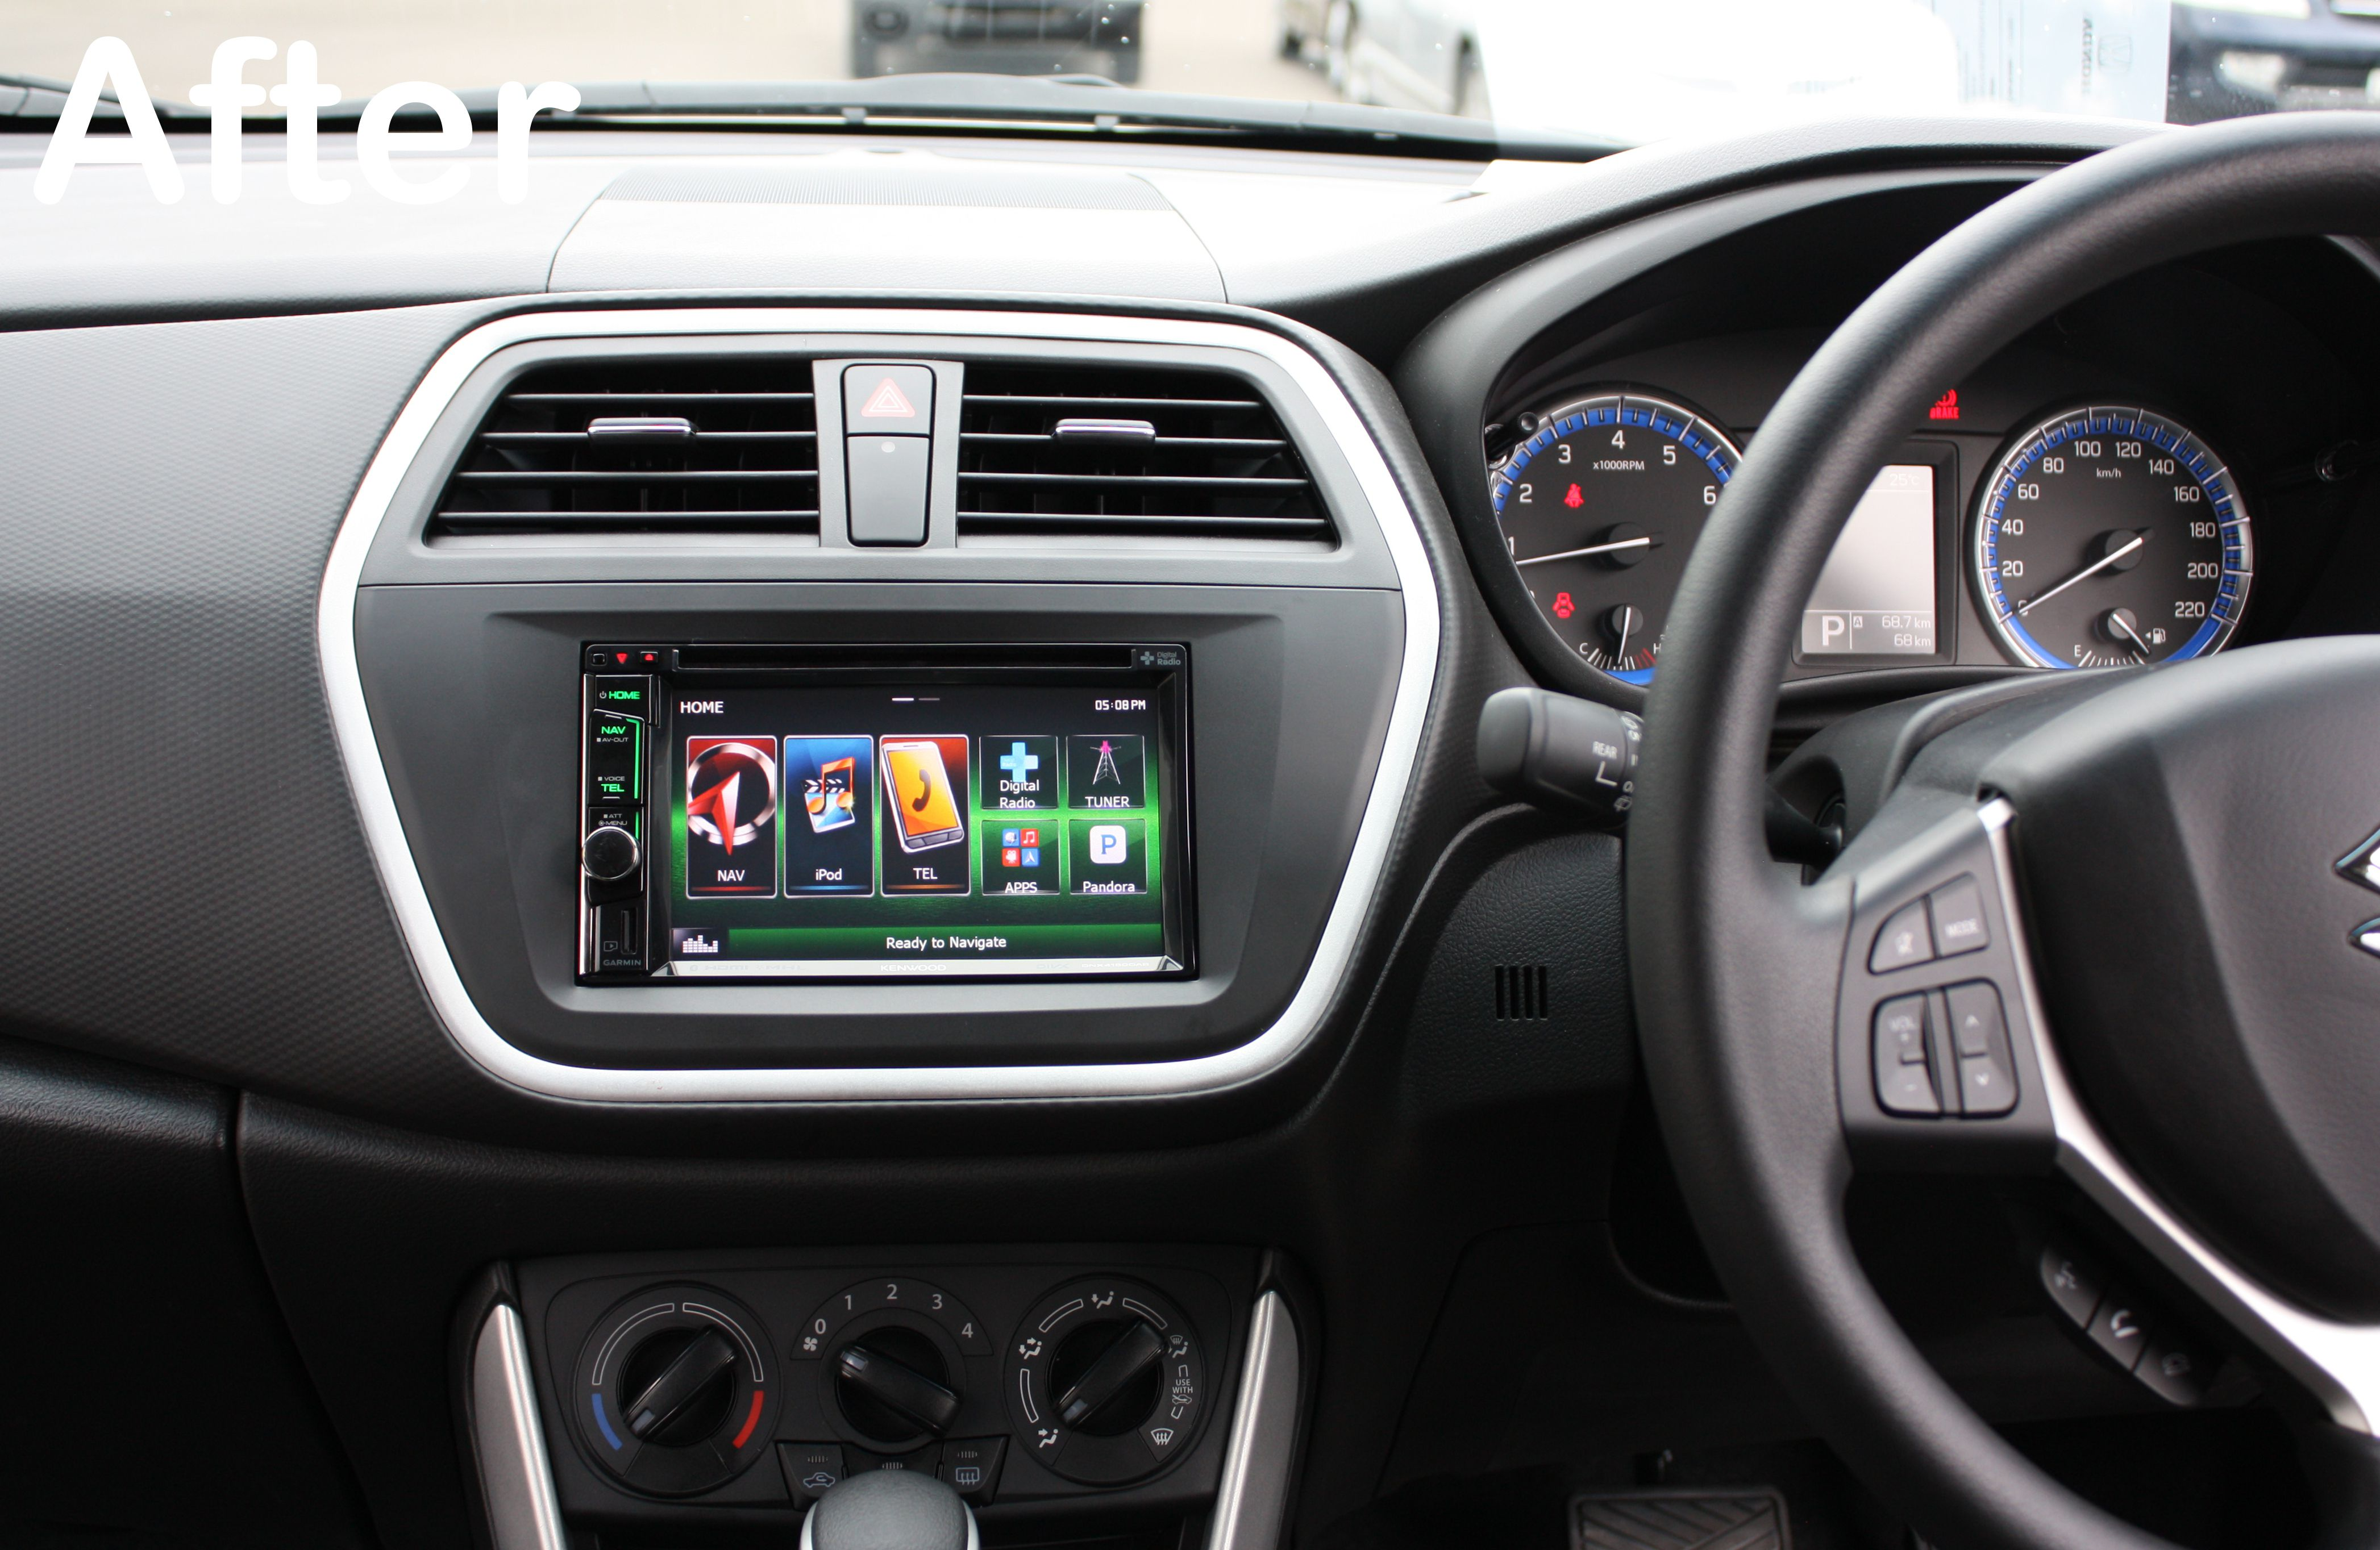 Suzuki S-Cross GPS Navigation System